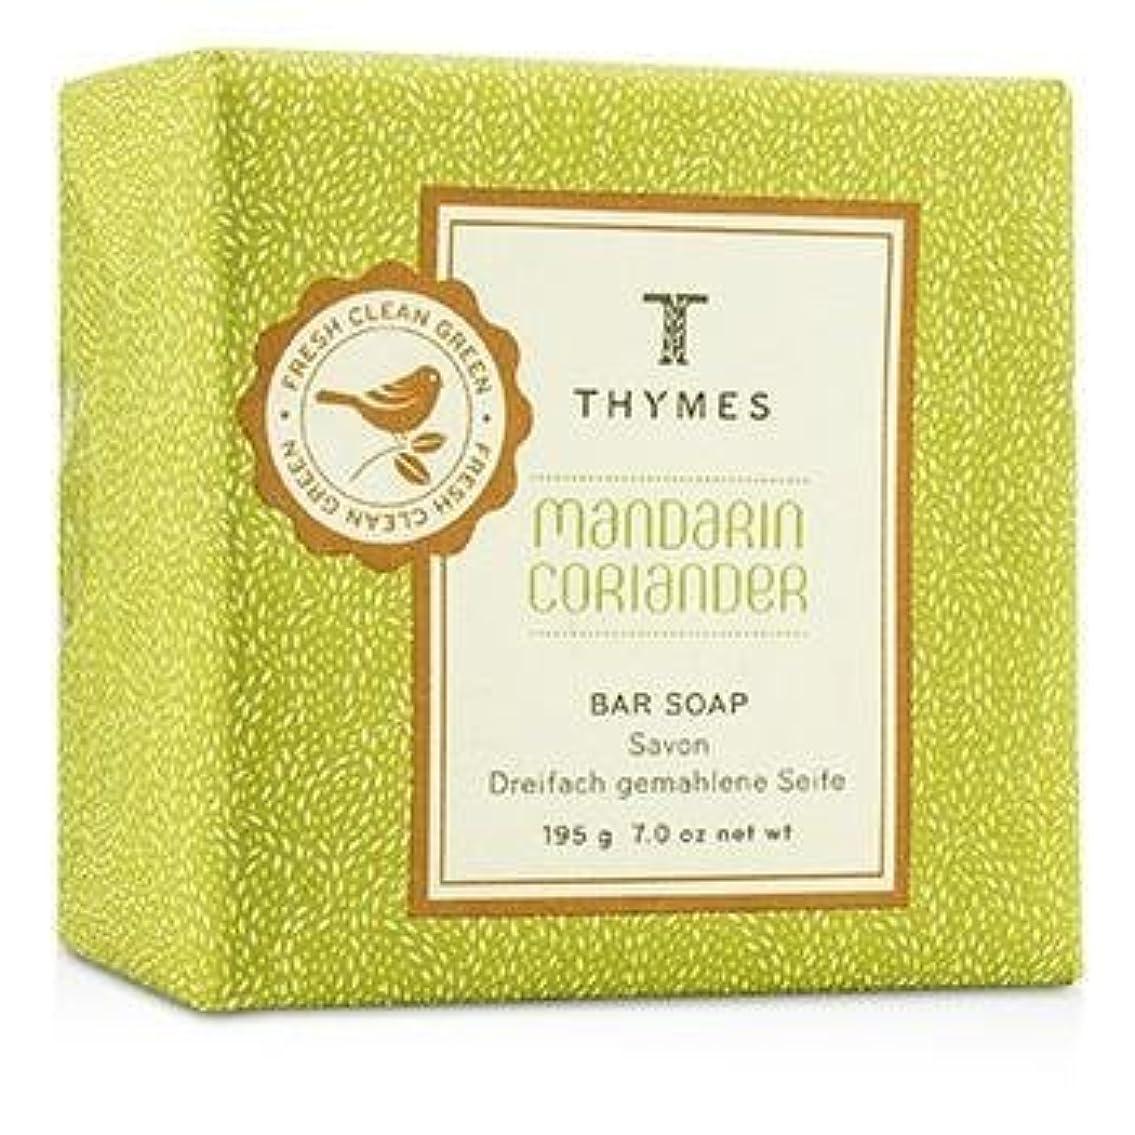 Thymes Mandarin Coriander Bar Soap 195g/7oz